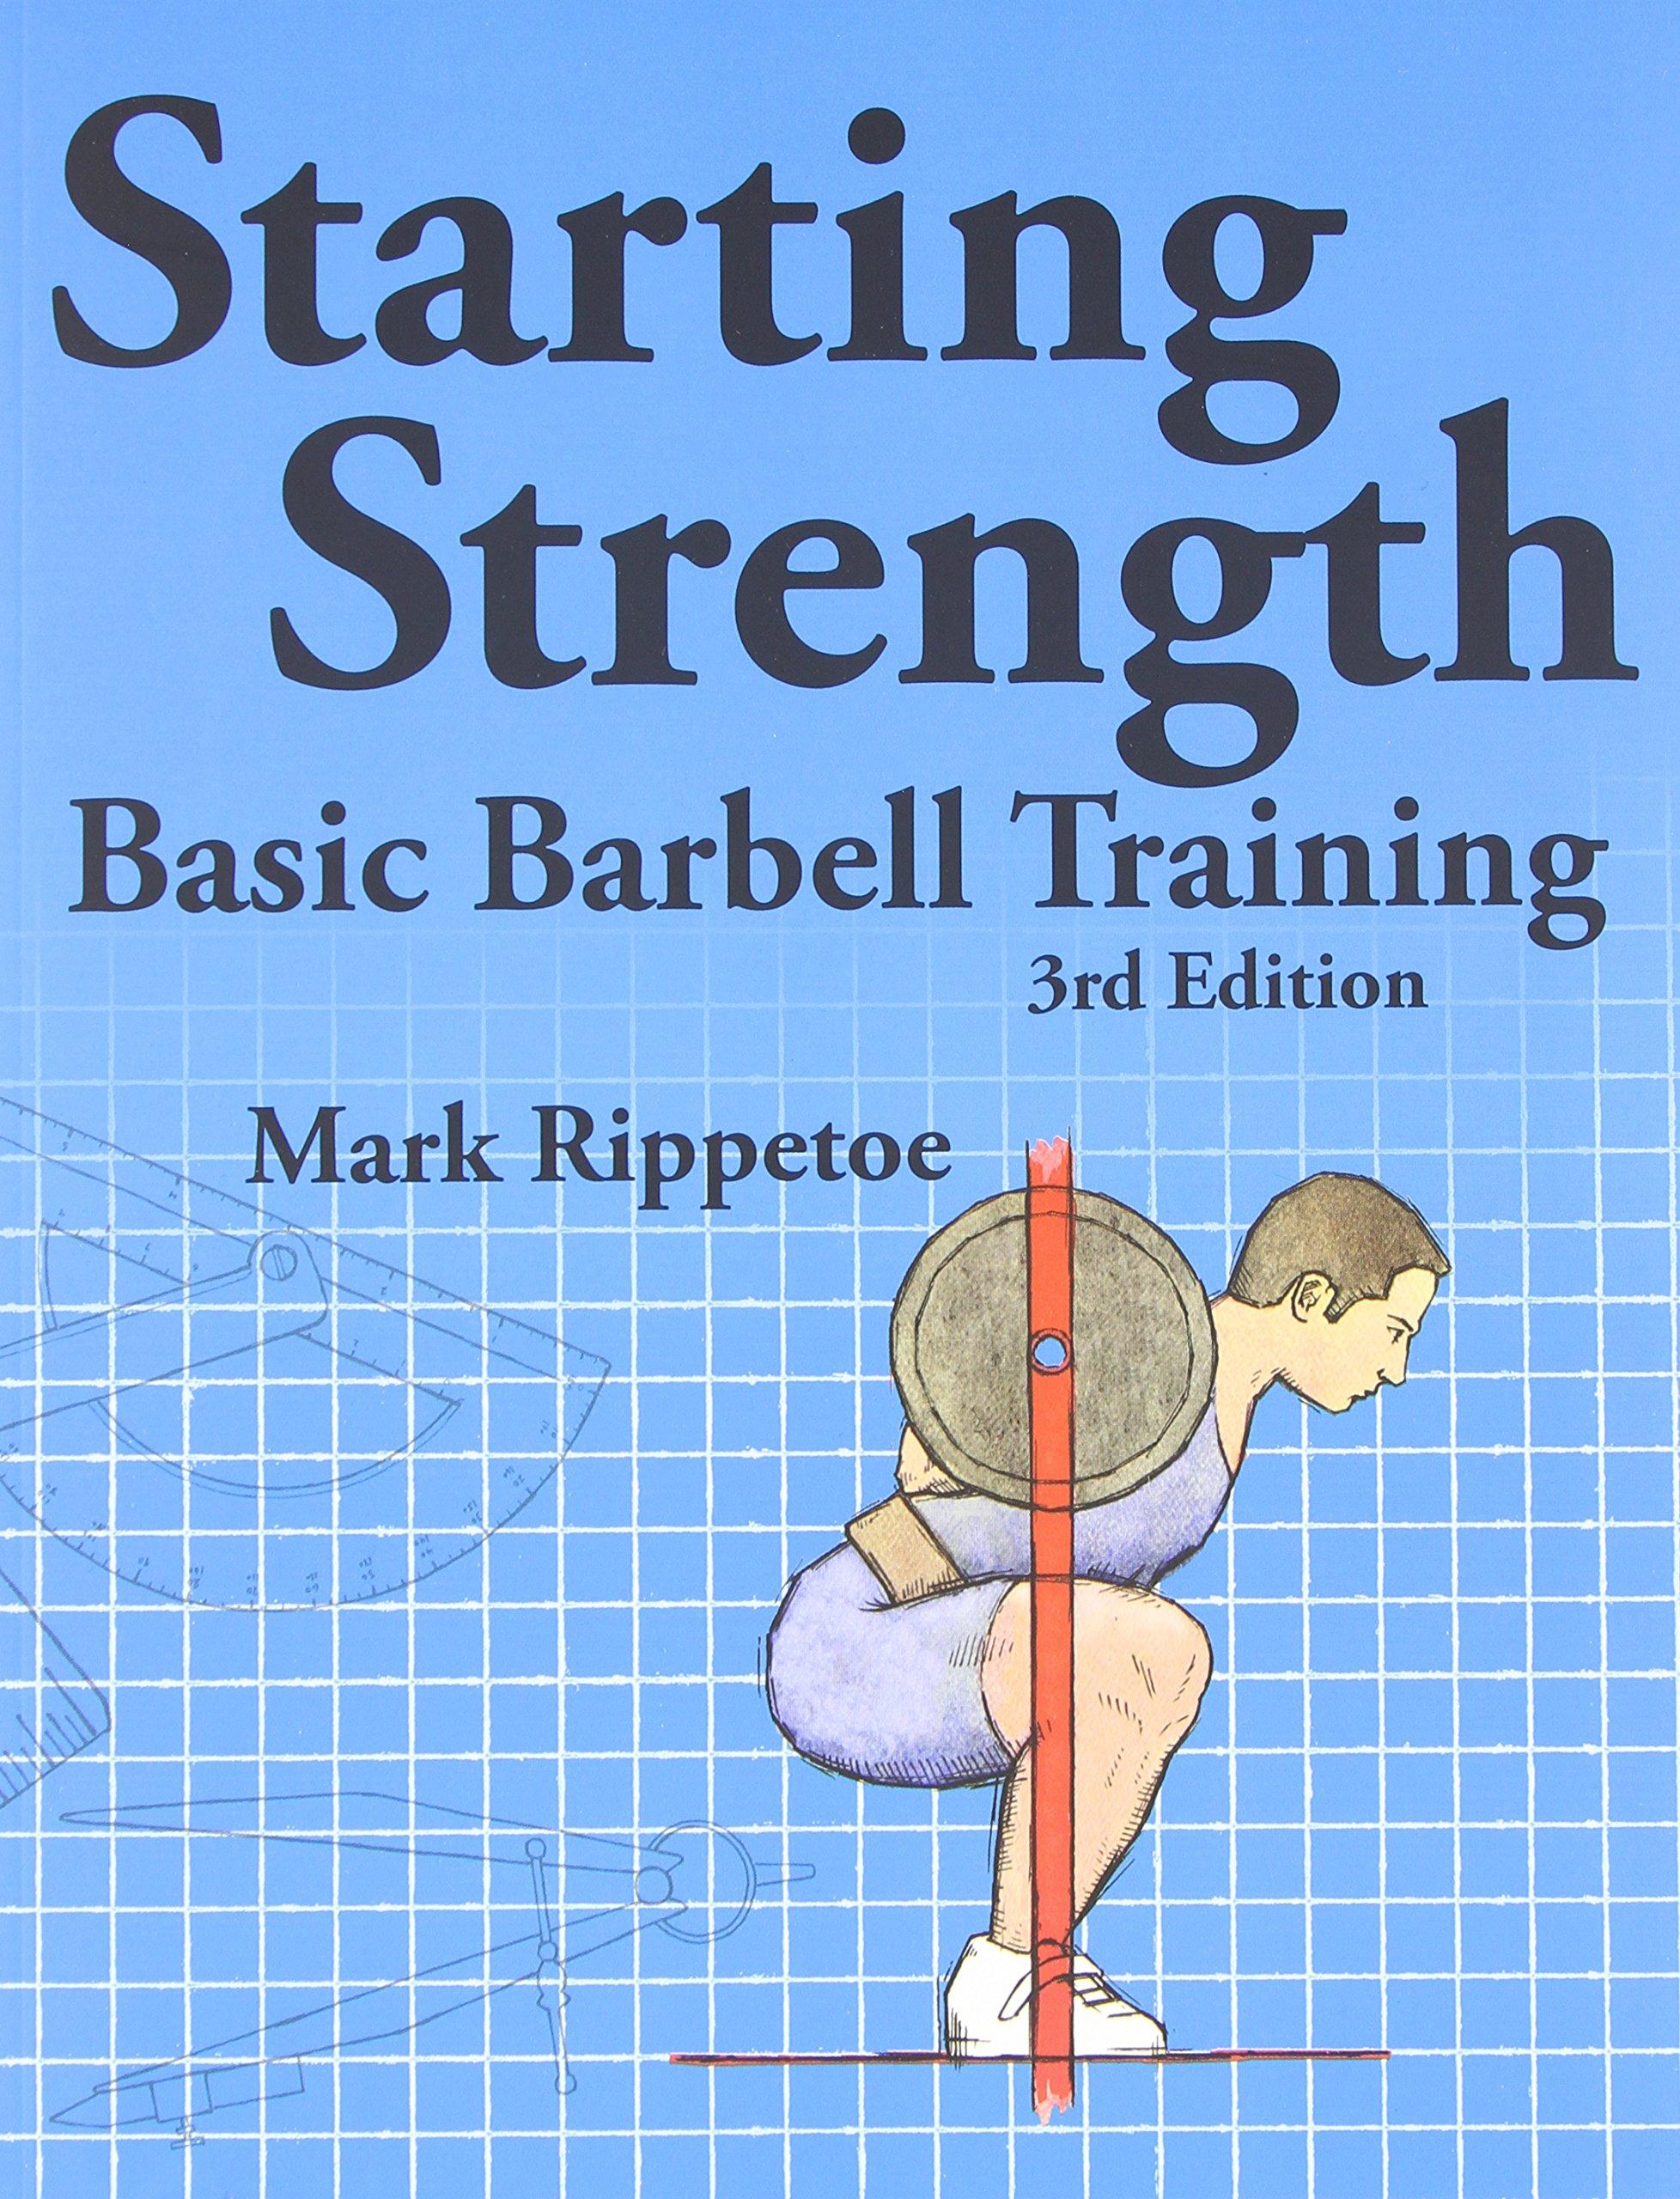 Starting Strength: Basic Barbell Training: Amazon.co.uk: Mark ...